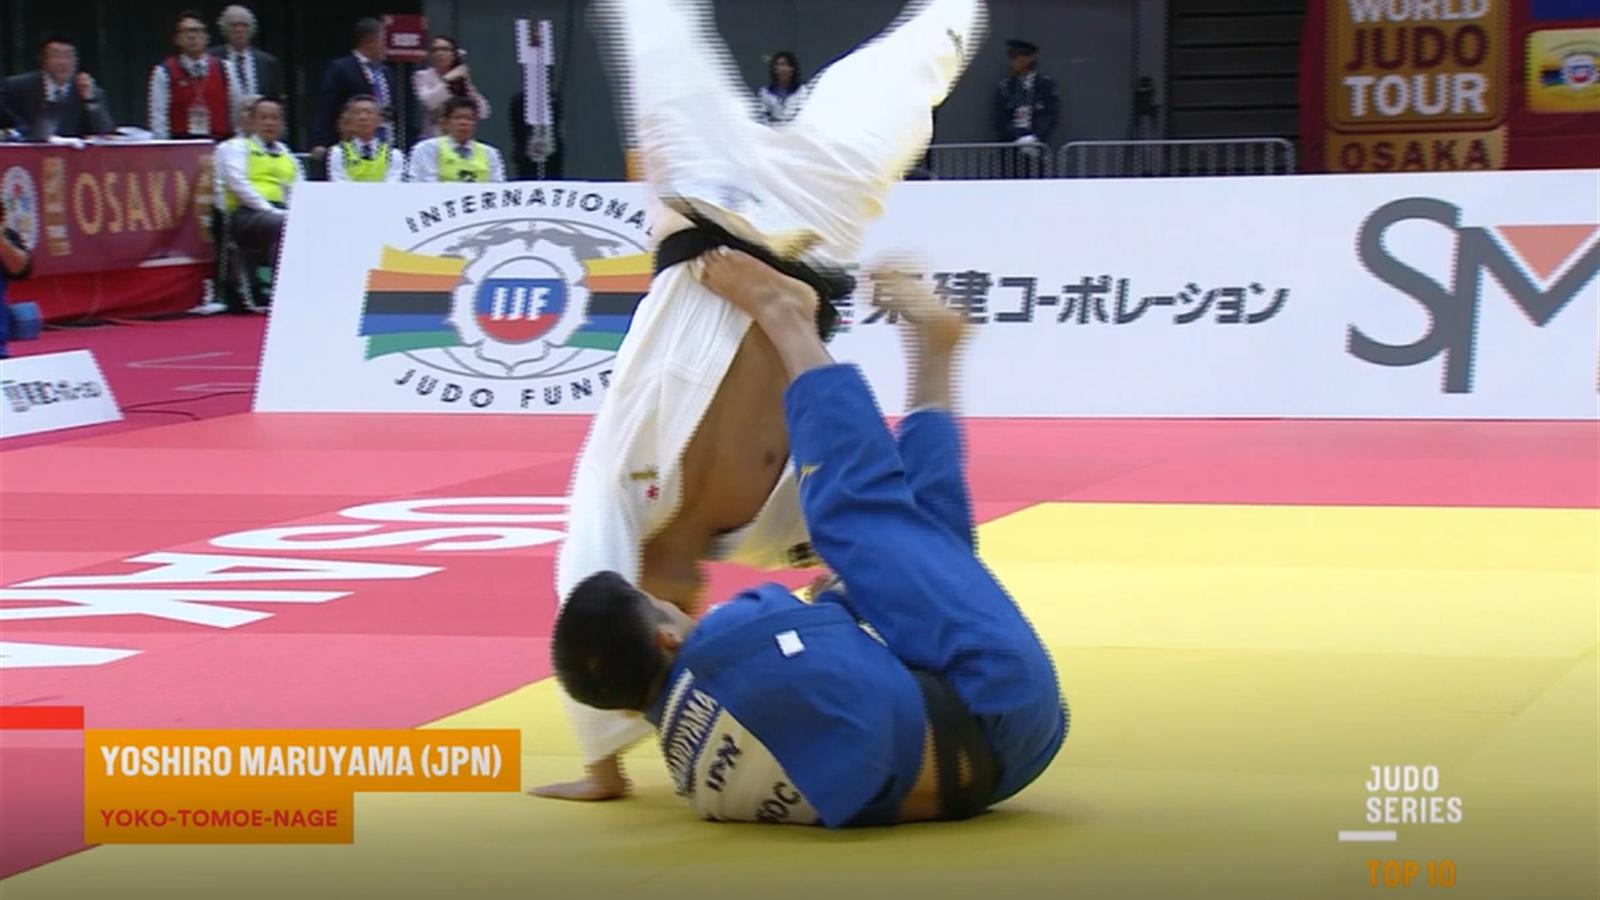 Top 10 best judo moments of 2018